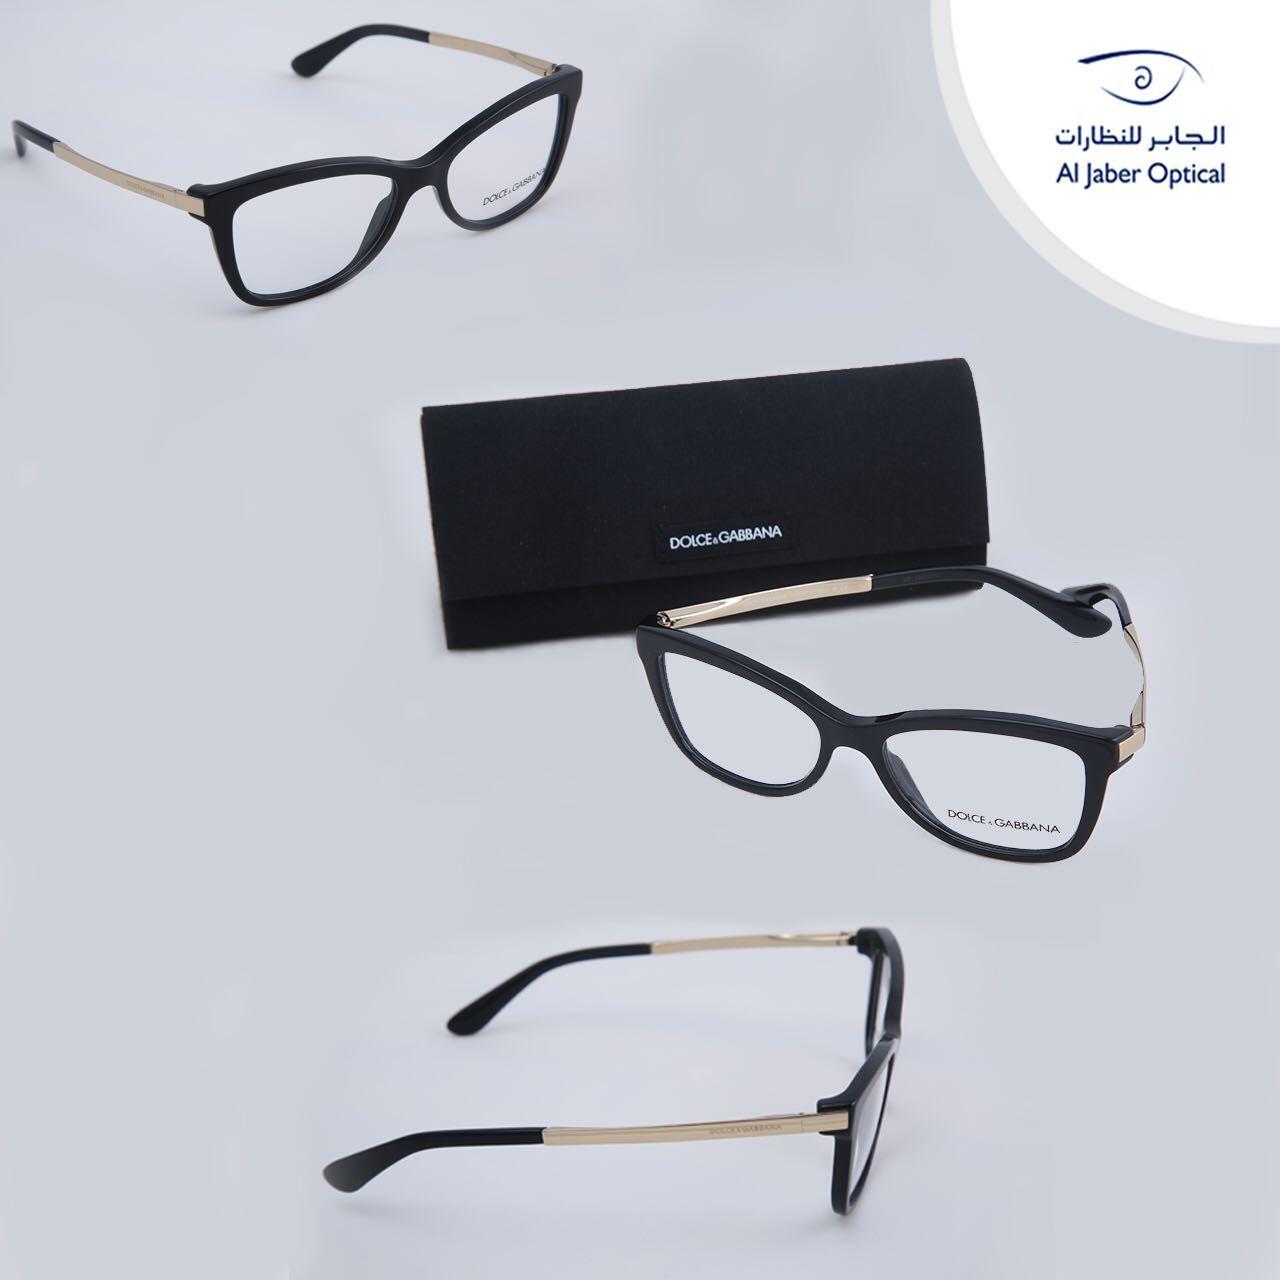 Dolce Gabbana Frames These Will Definitely Speak أجعلي طلتك مميزة و أنيقة مع نظارات دولتشي اند غابانا Dolce And Gabbana Eyewear Dolce And Gabbana Eyewear